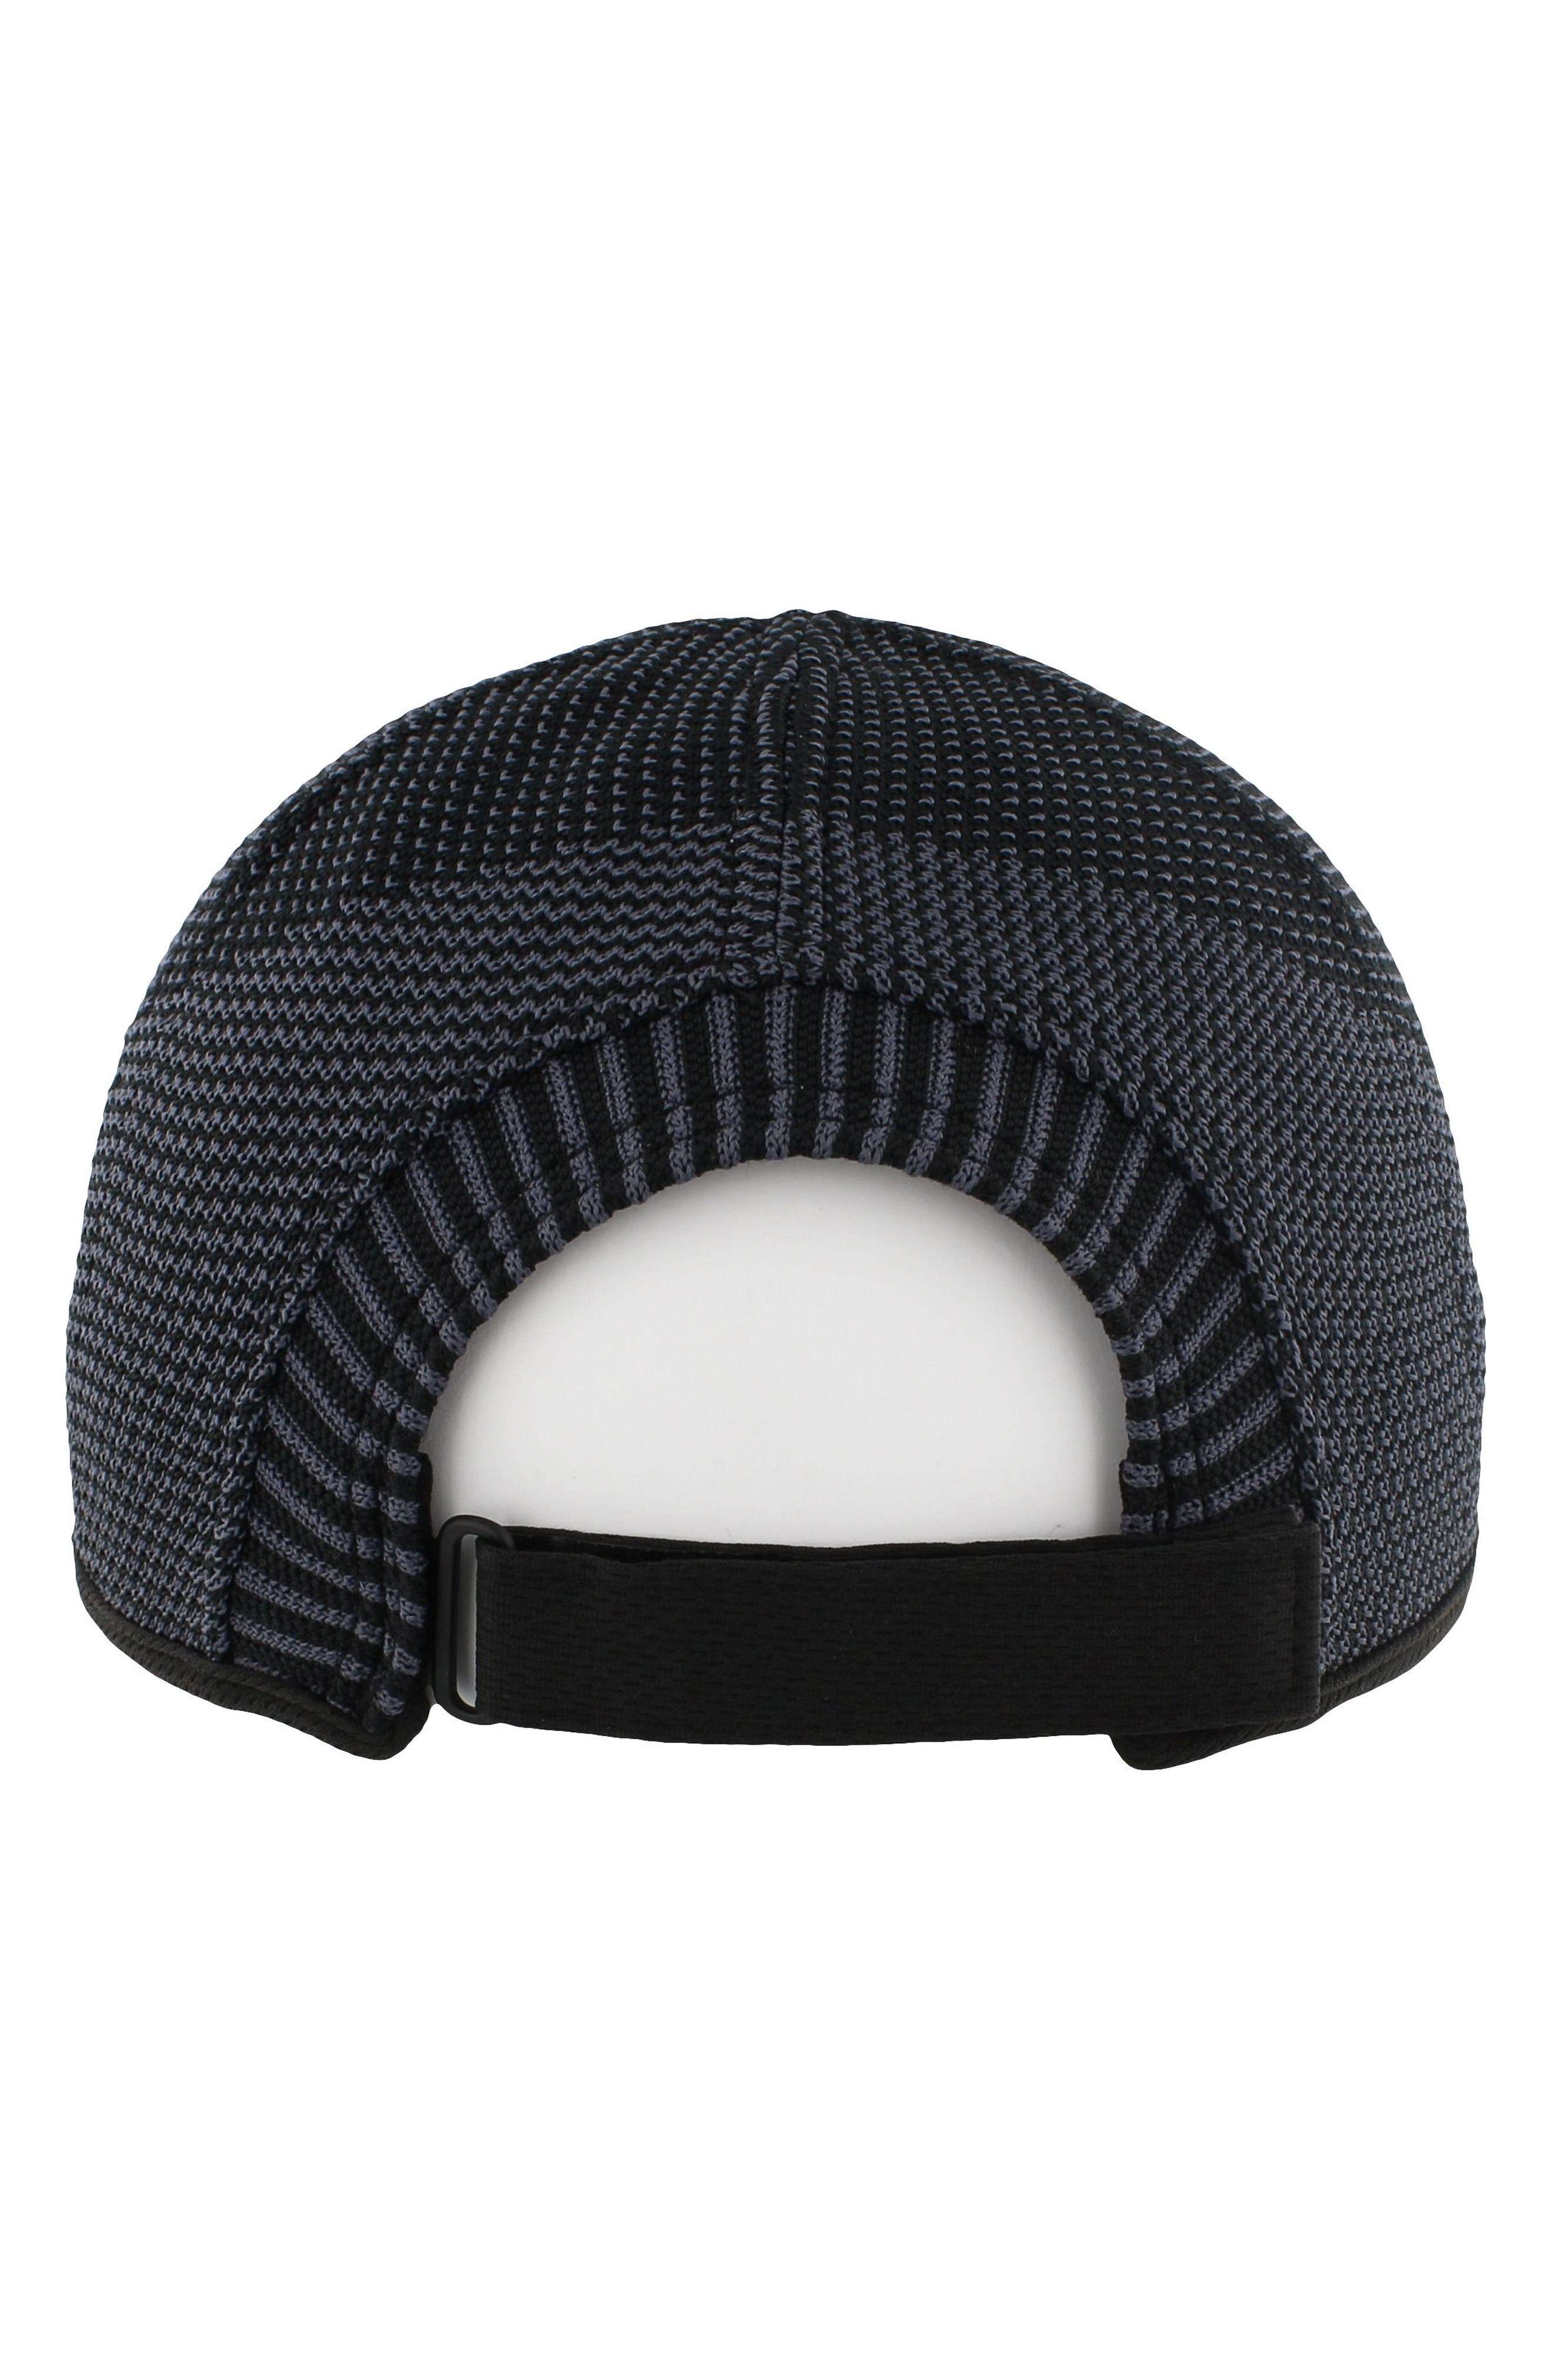 NMD Prime Ball Cap,                             Alternate thumbnail 6, color,                             Black